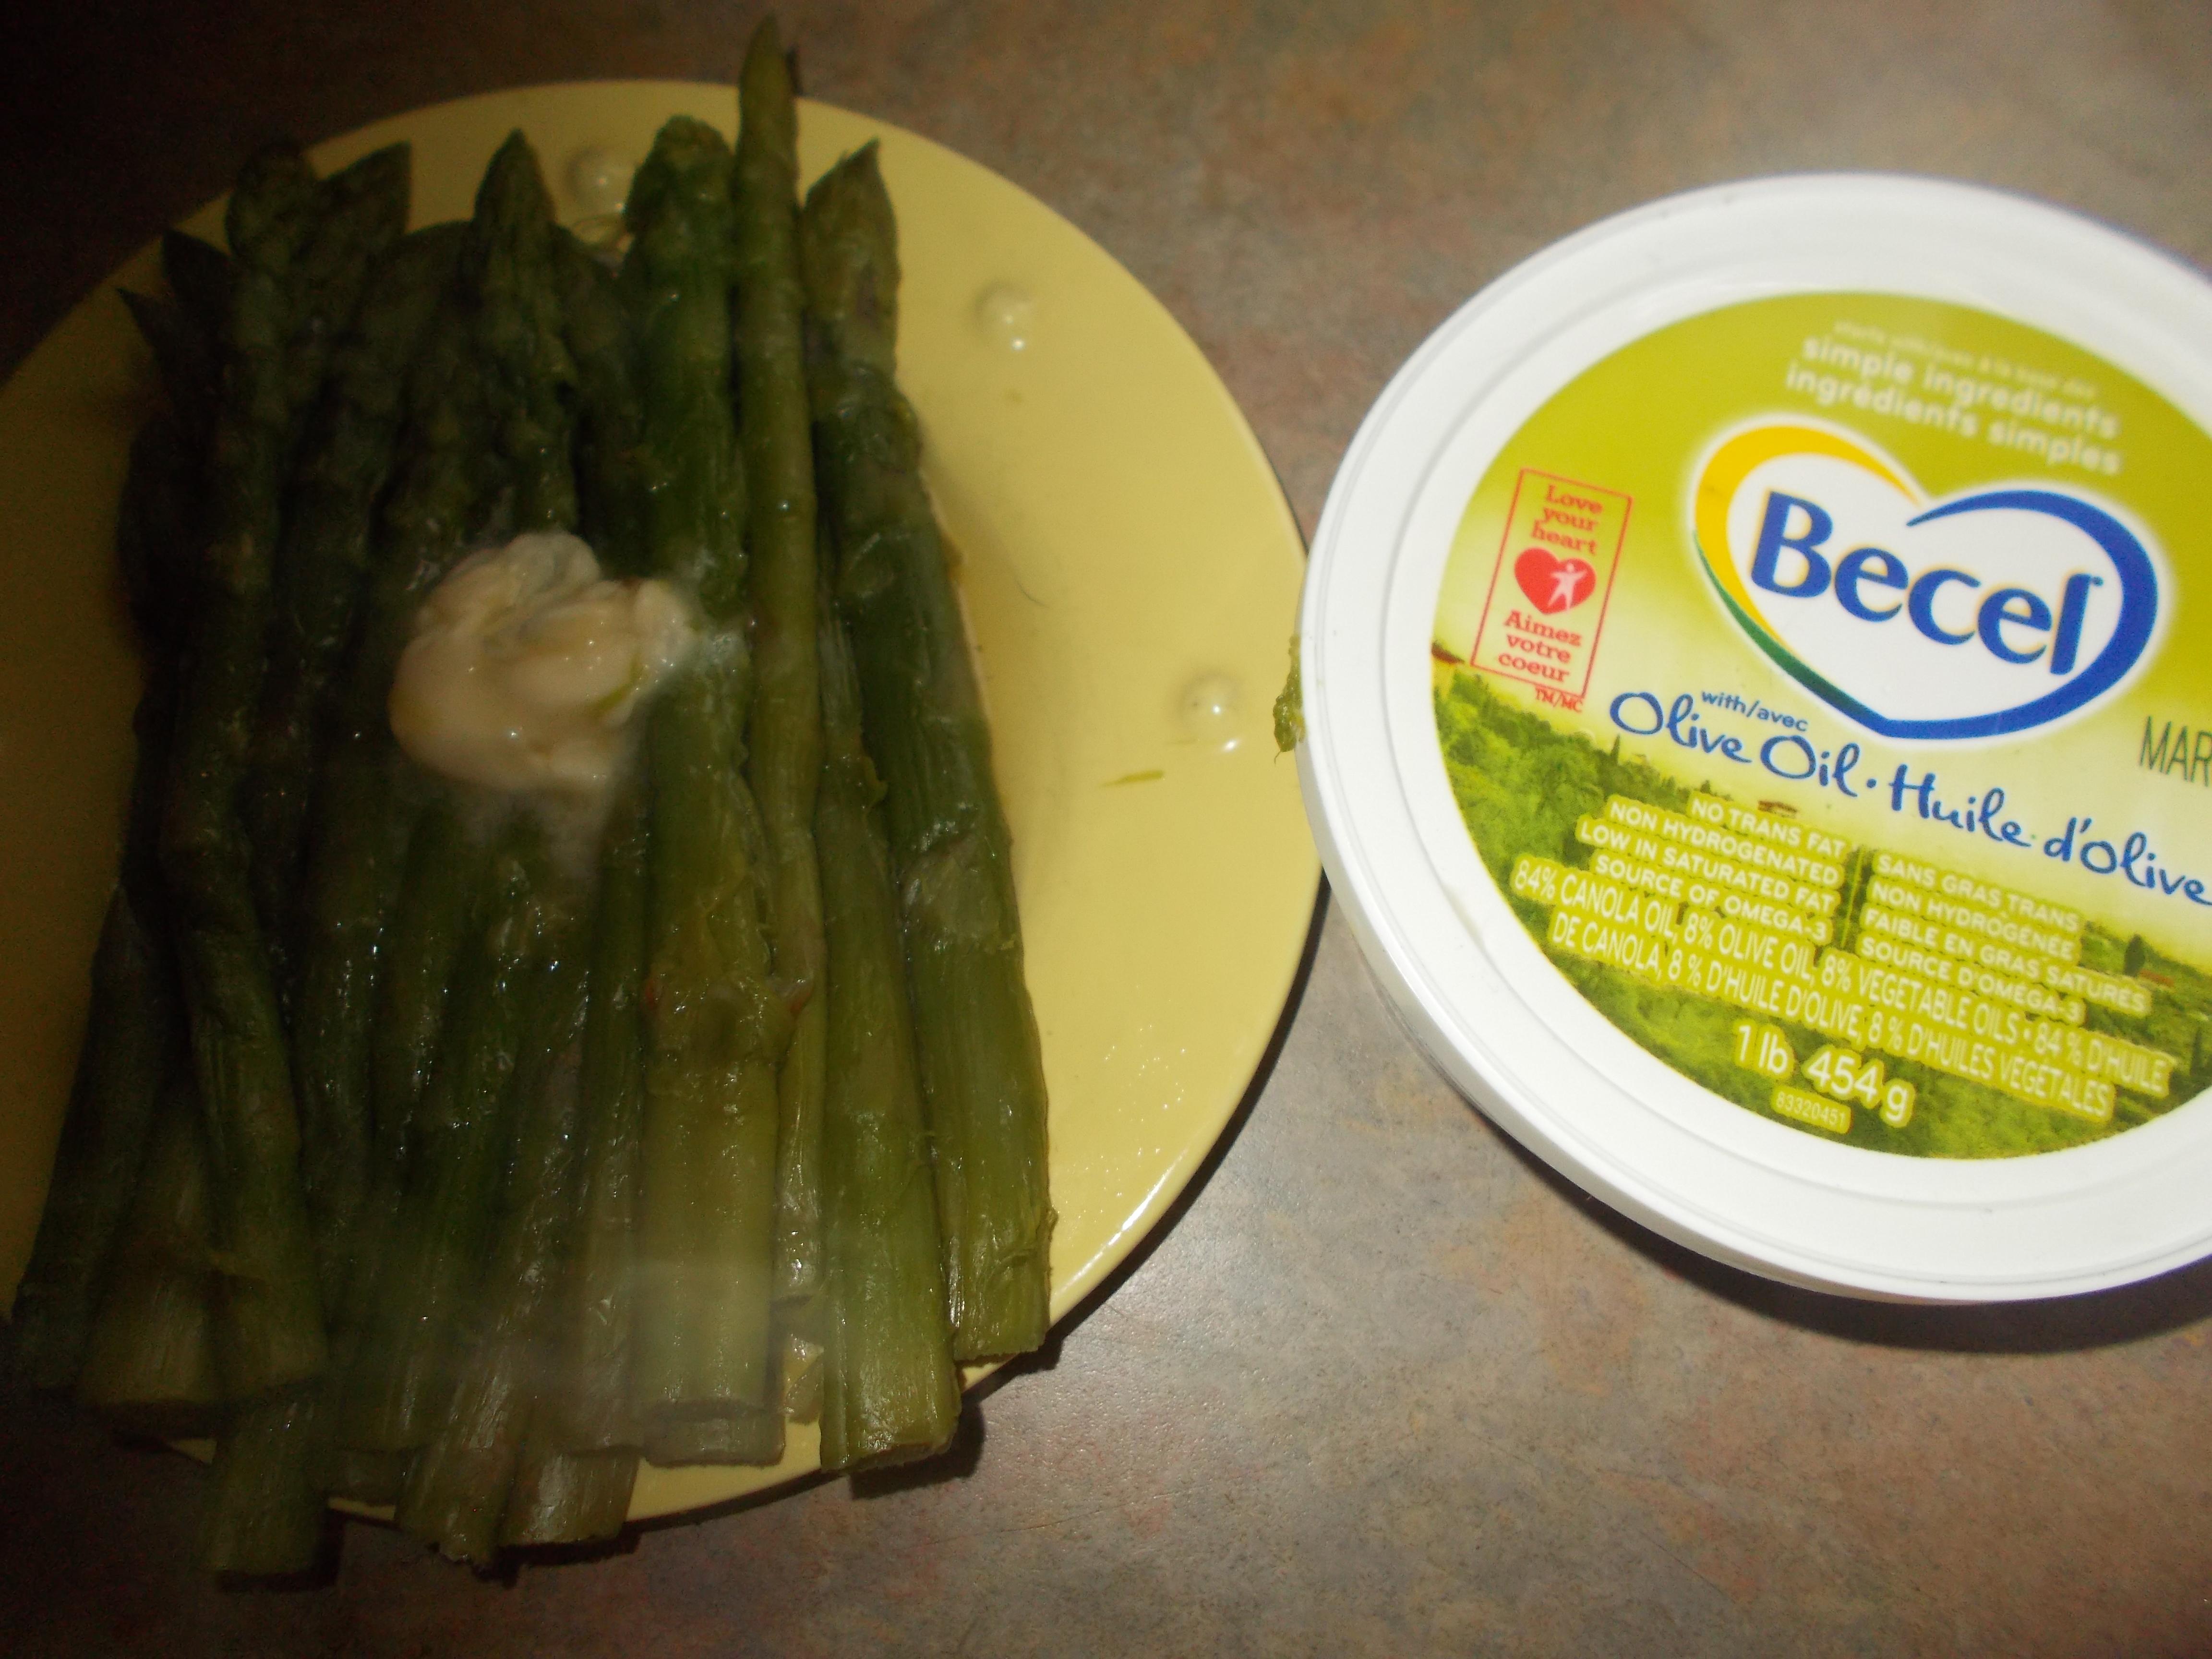 Becel® Olive Oil margarine reviews in Butter & Margarine